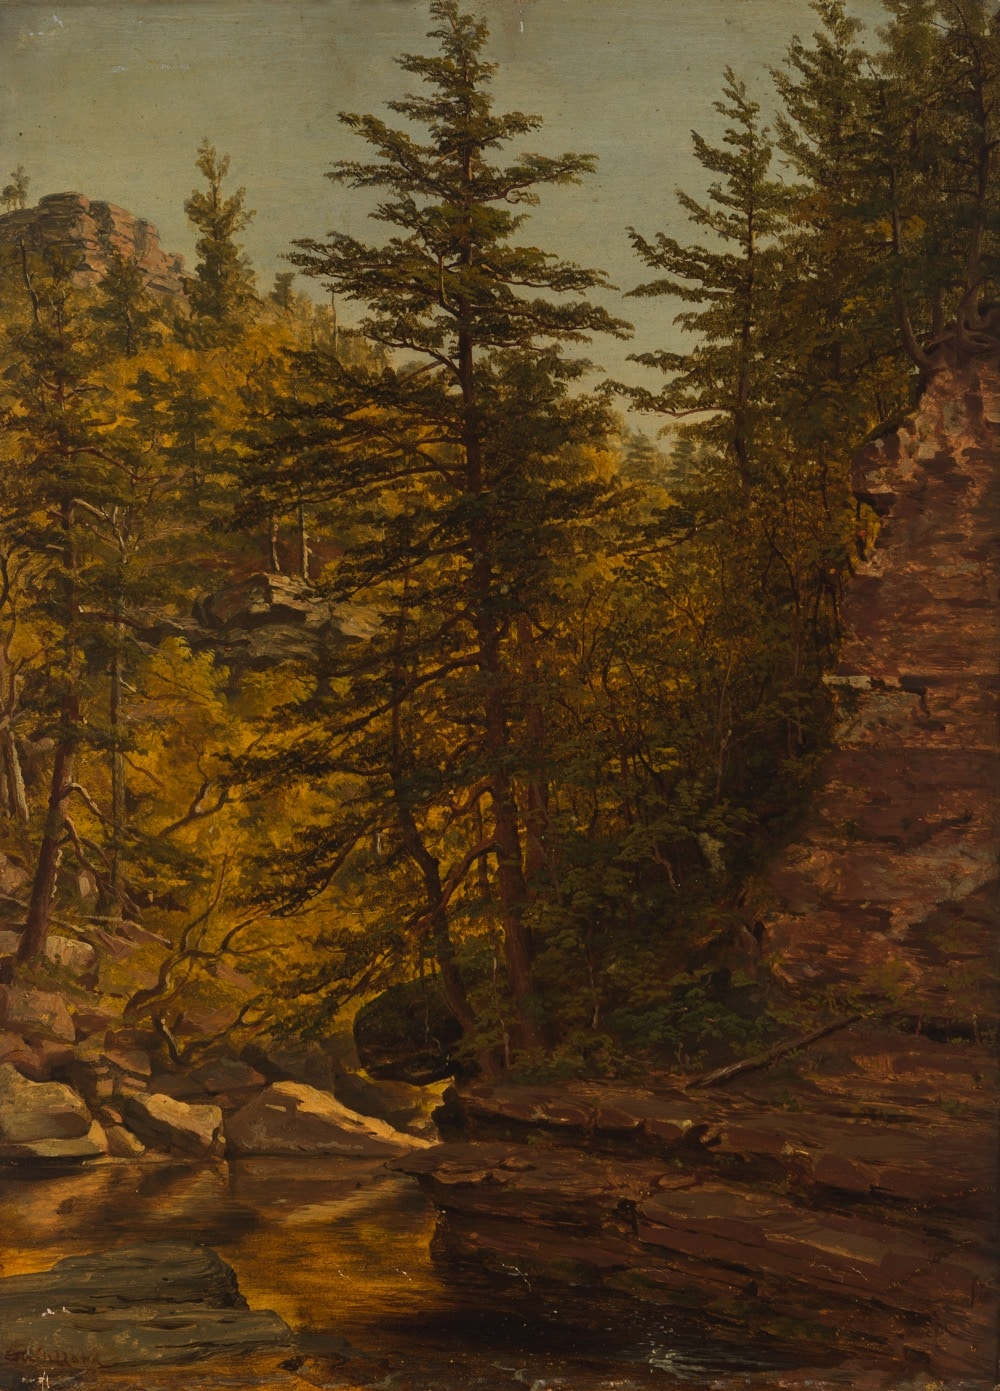 Sanford Robinson Gifford (1823-1880 Massachusetts/New York)